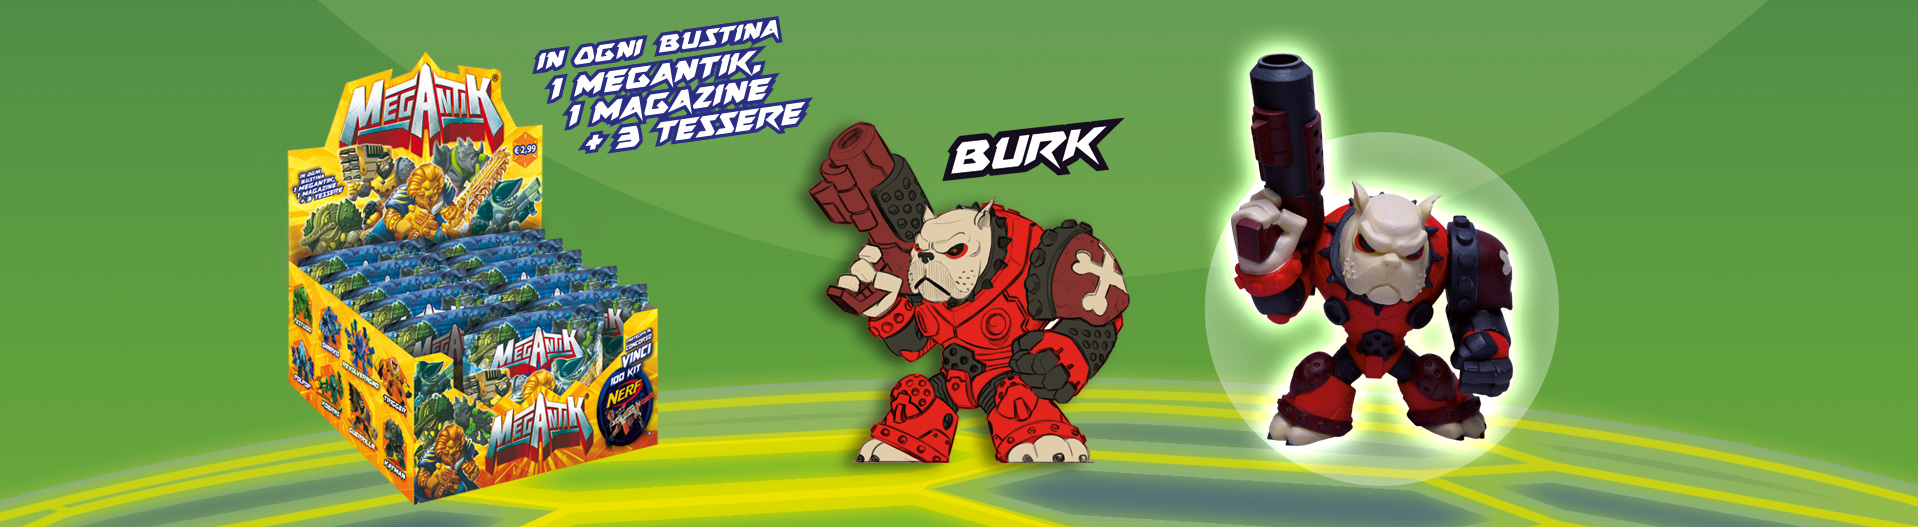 BURK1